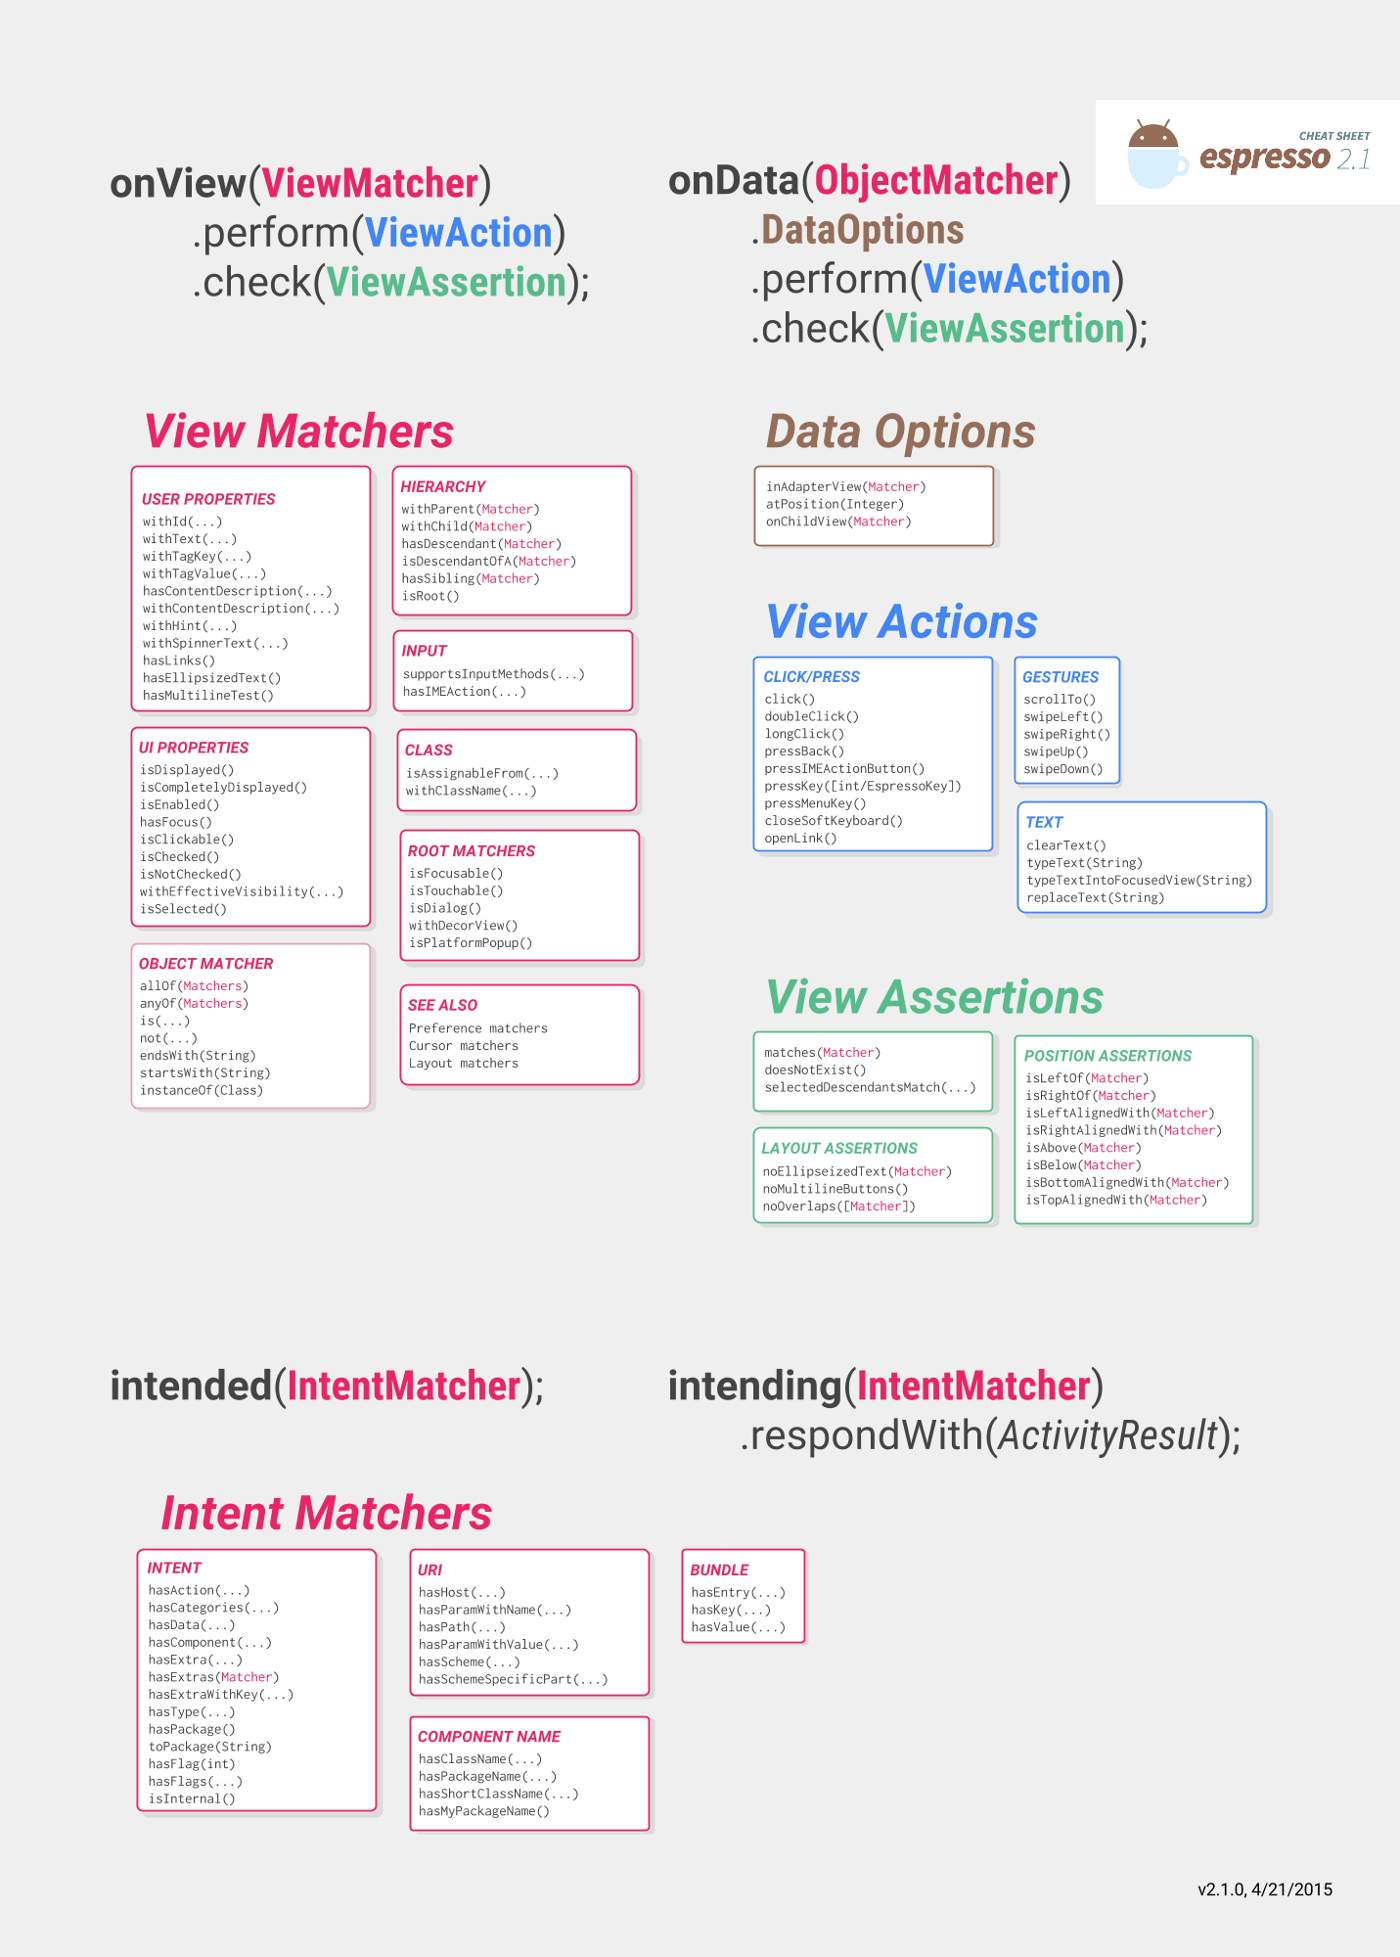 onView(), onData(), intended() 및 intending()에 사용 가능한 메서드 목록